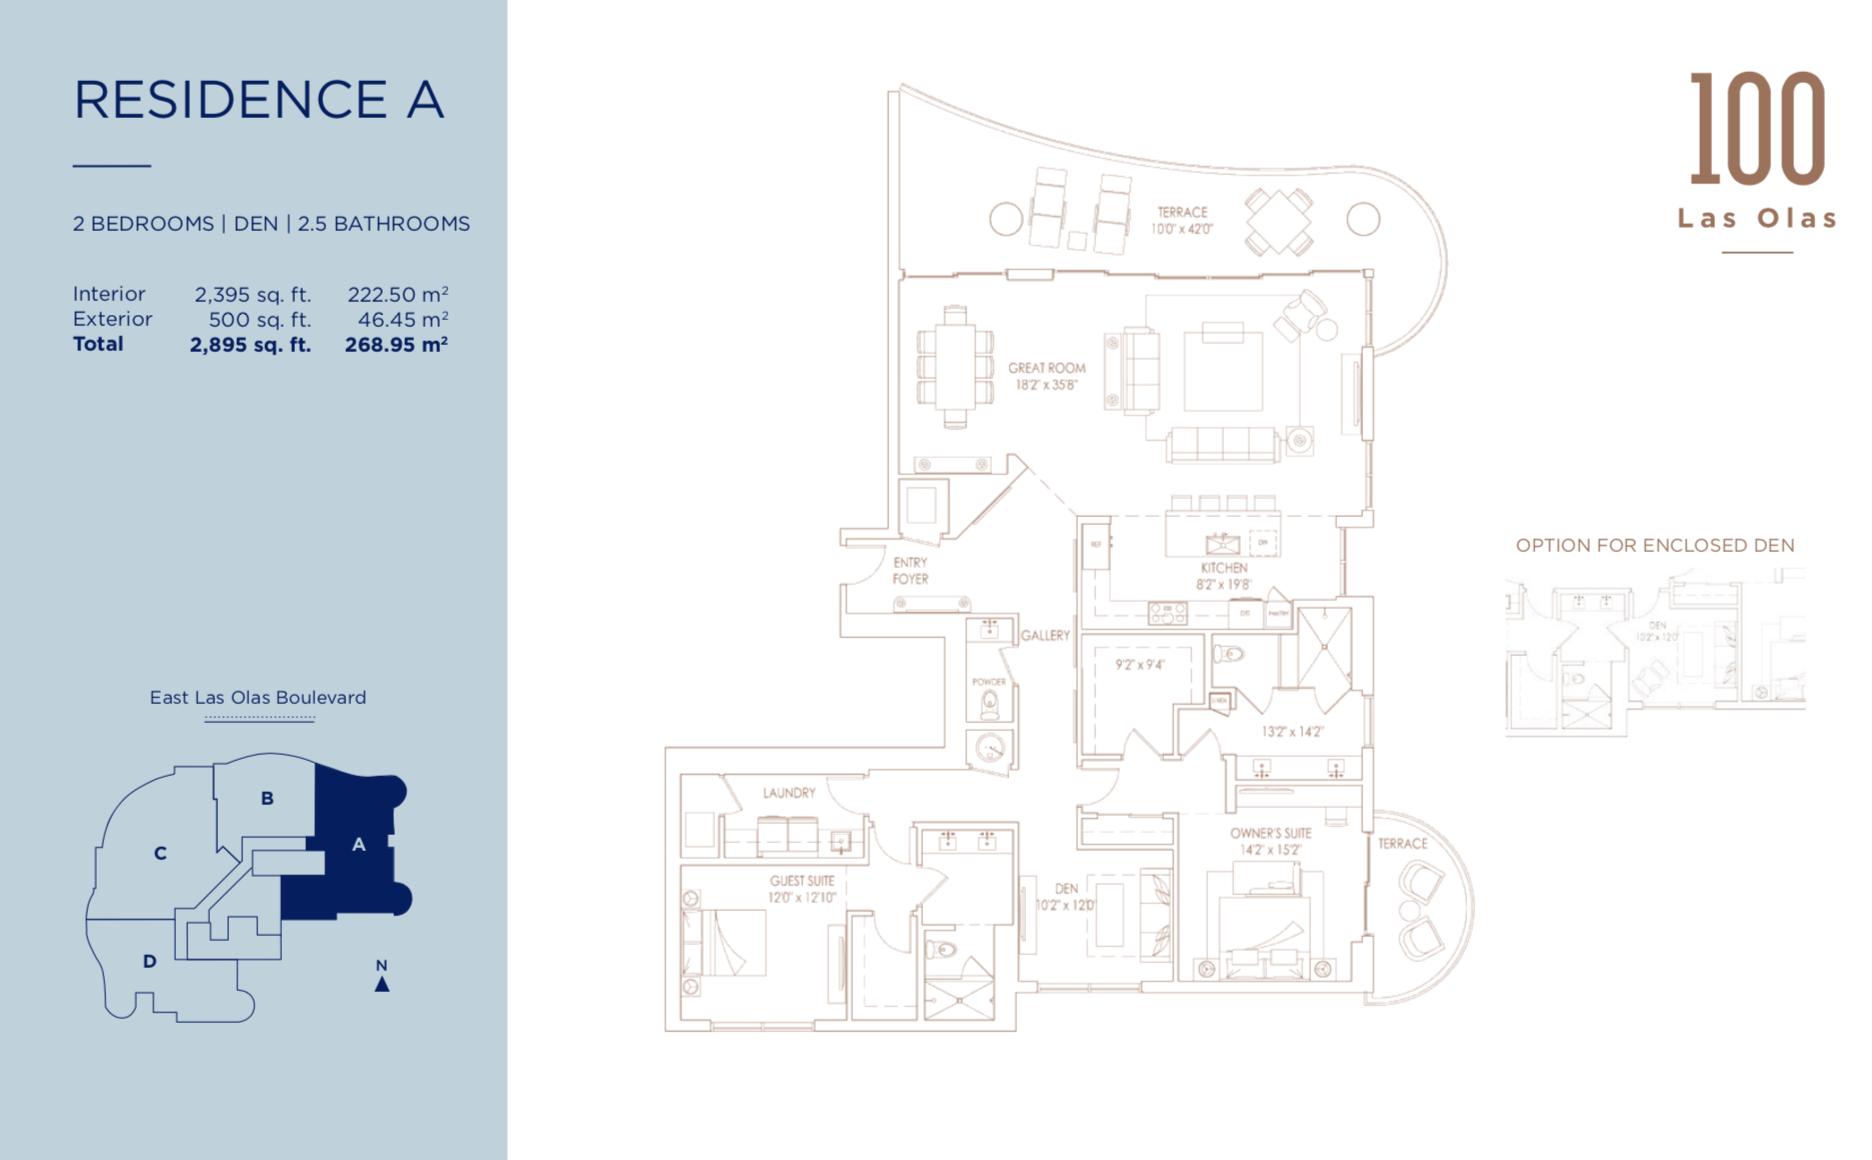 100 Las Olas Fort Lauderdale | Residence A  | 2 Beds + Den | 2.5 Baths